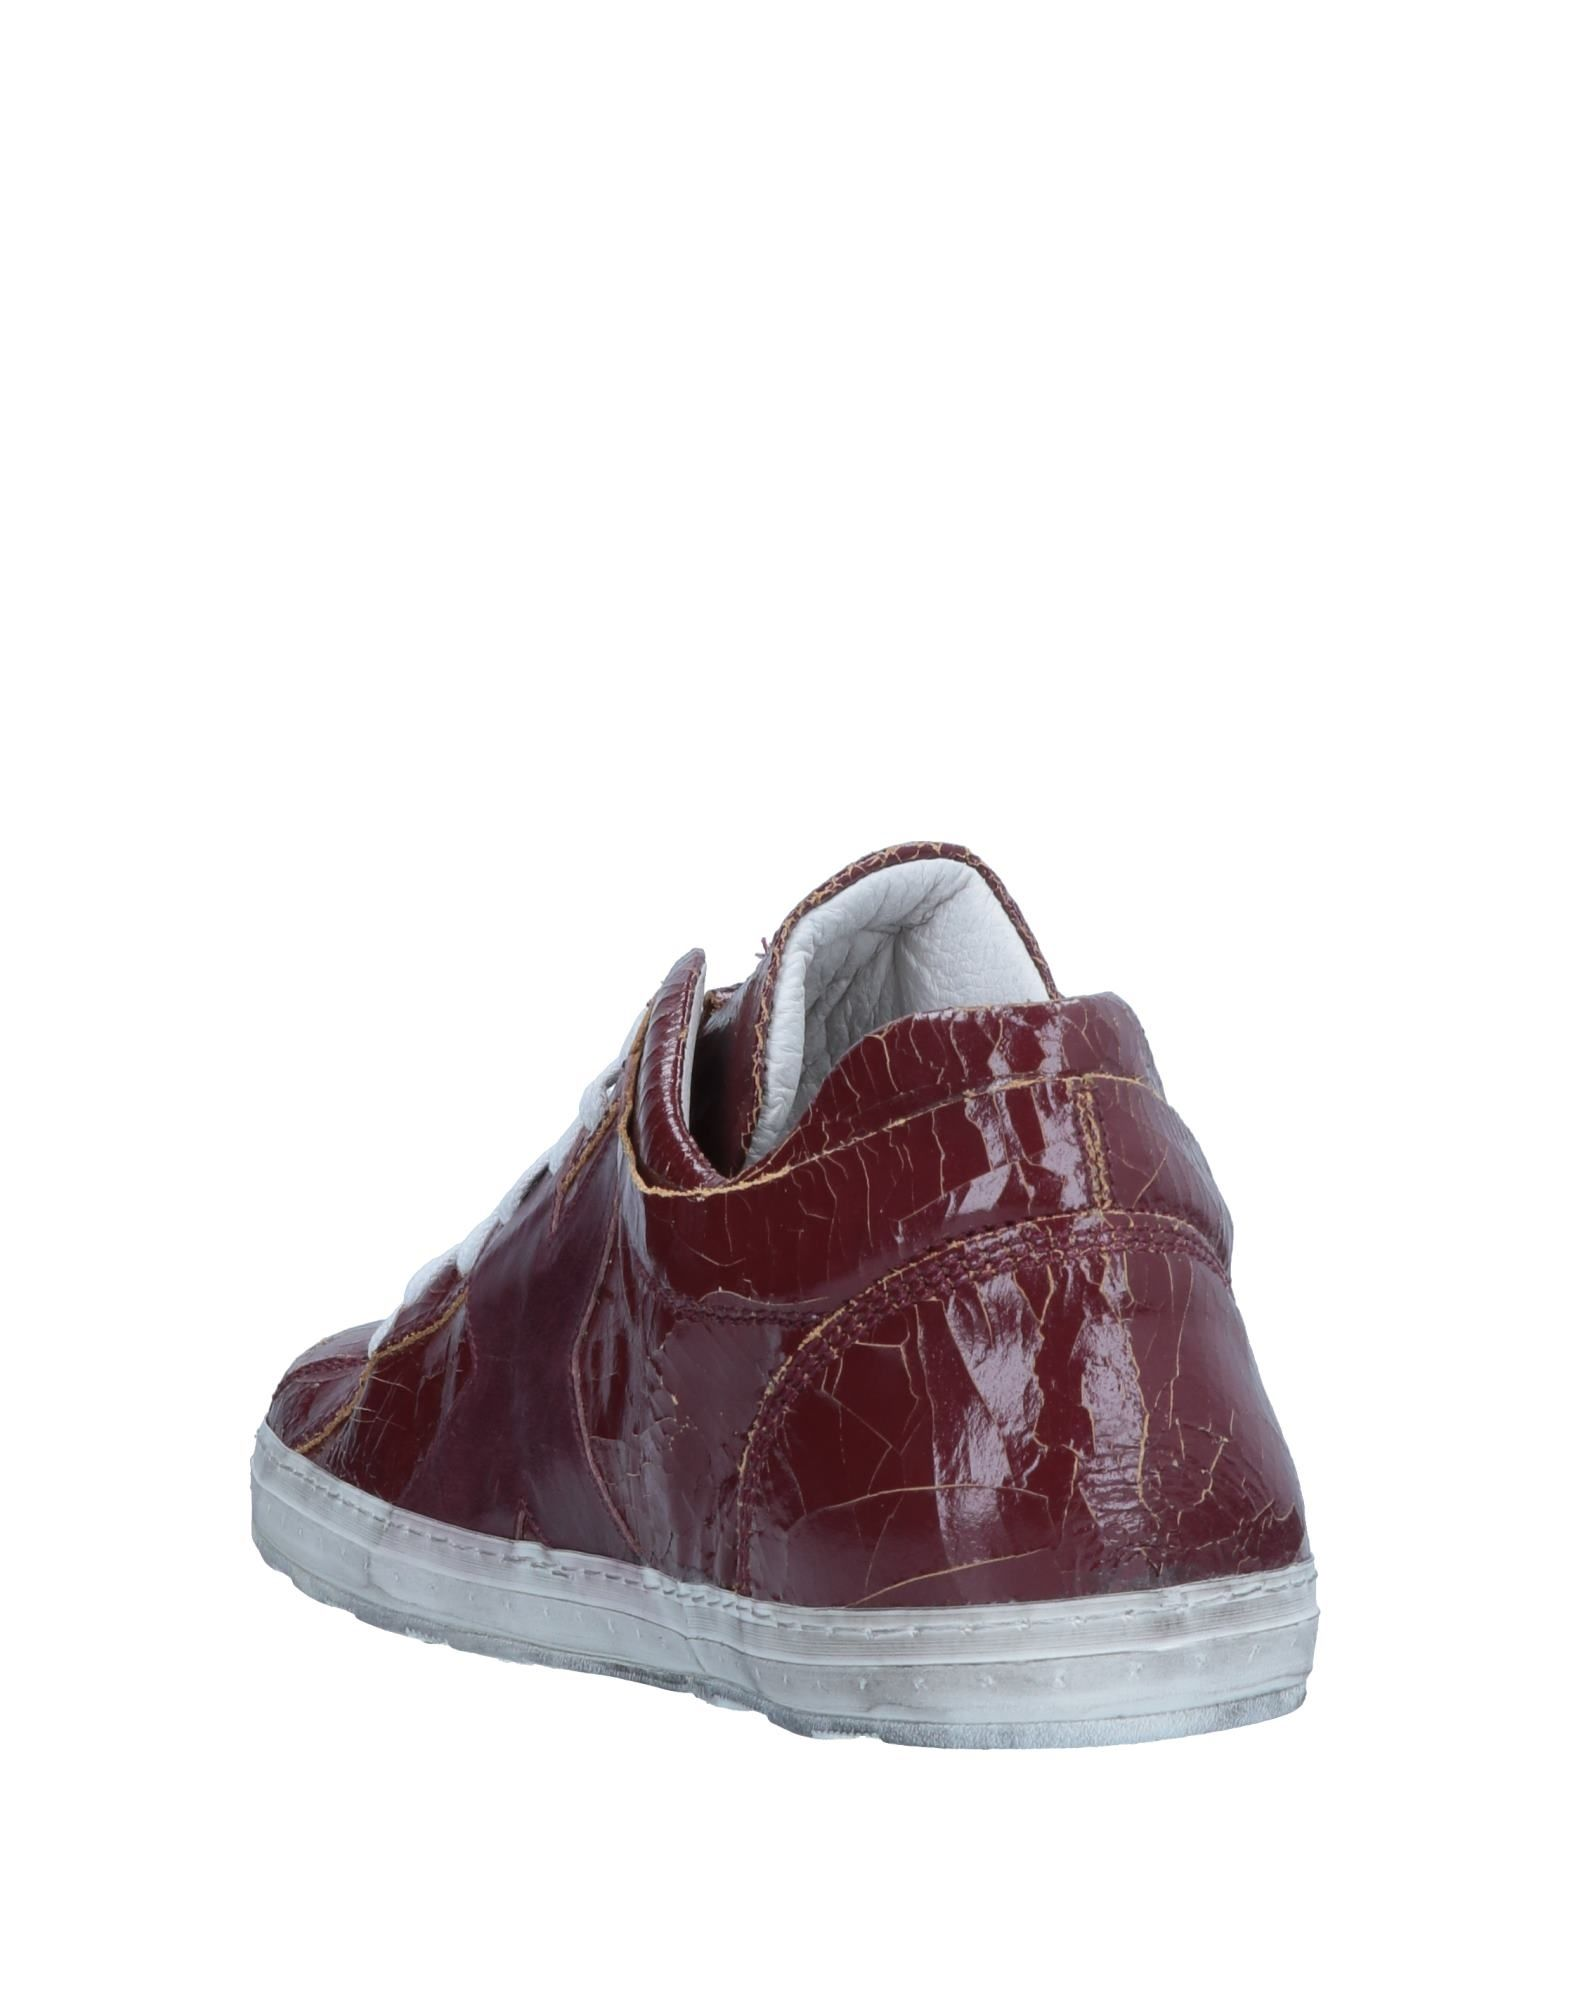 Rabatt echte Sneakers Schuhe O.X.S. Sneakers echte Herren  11551022NE 8e5541